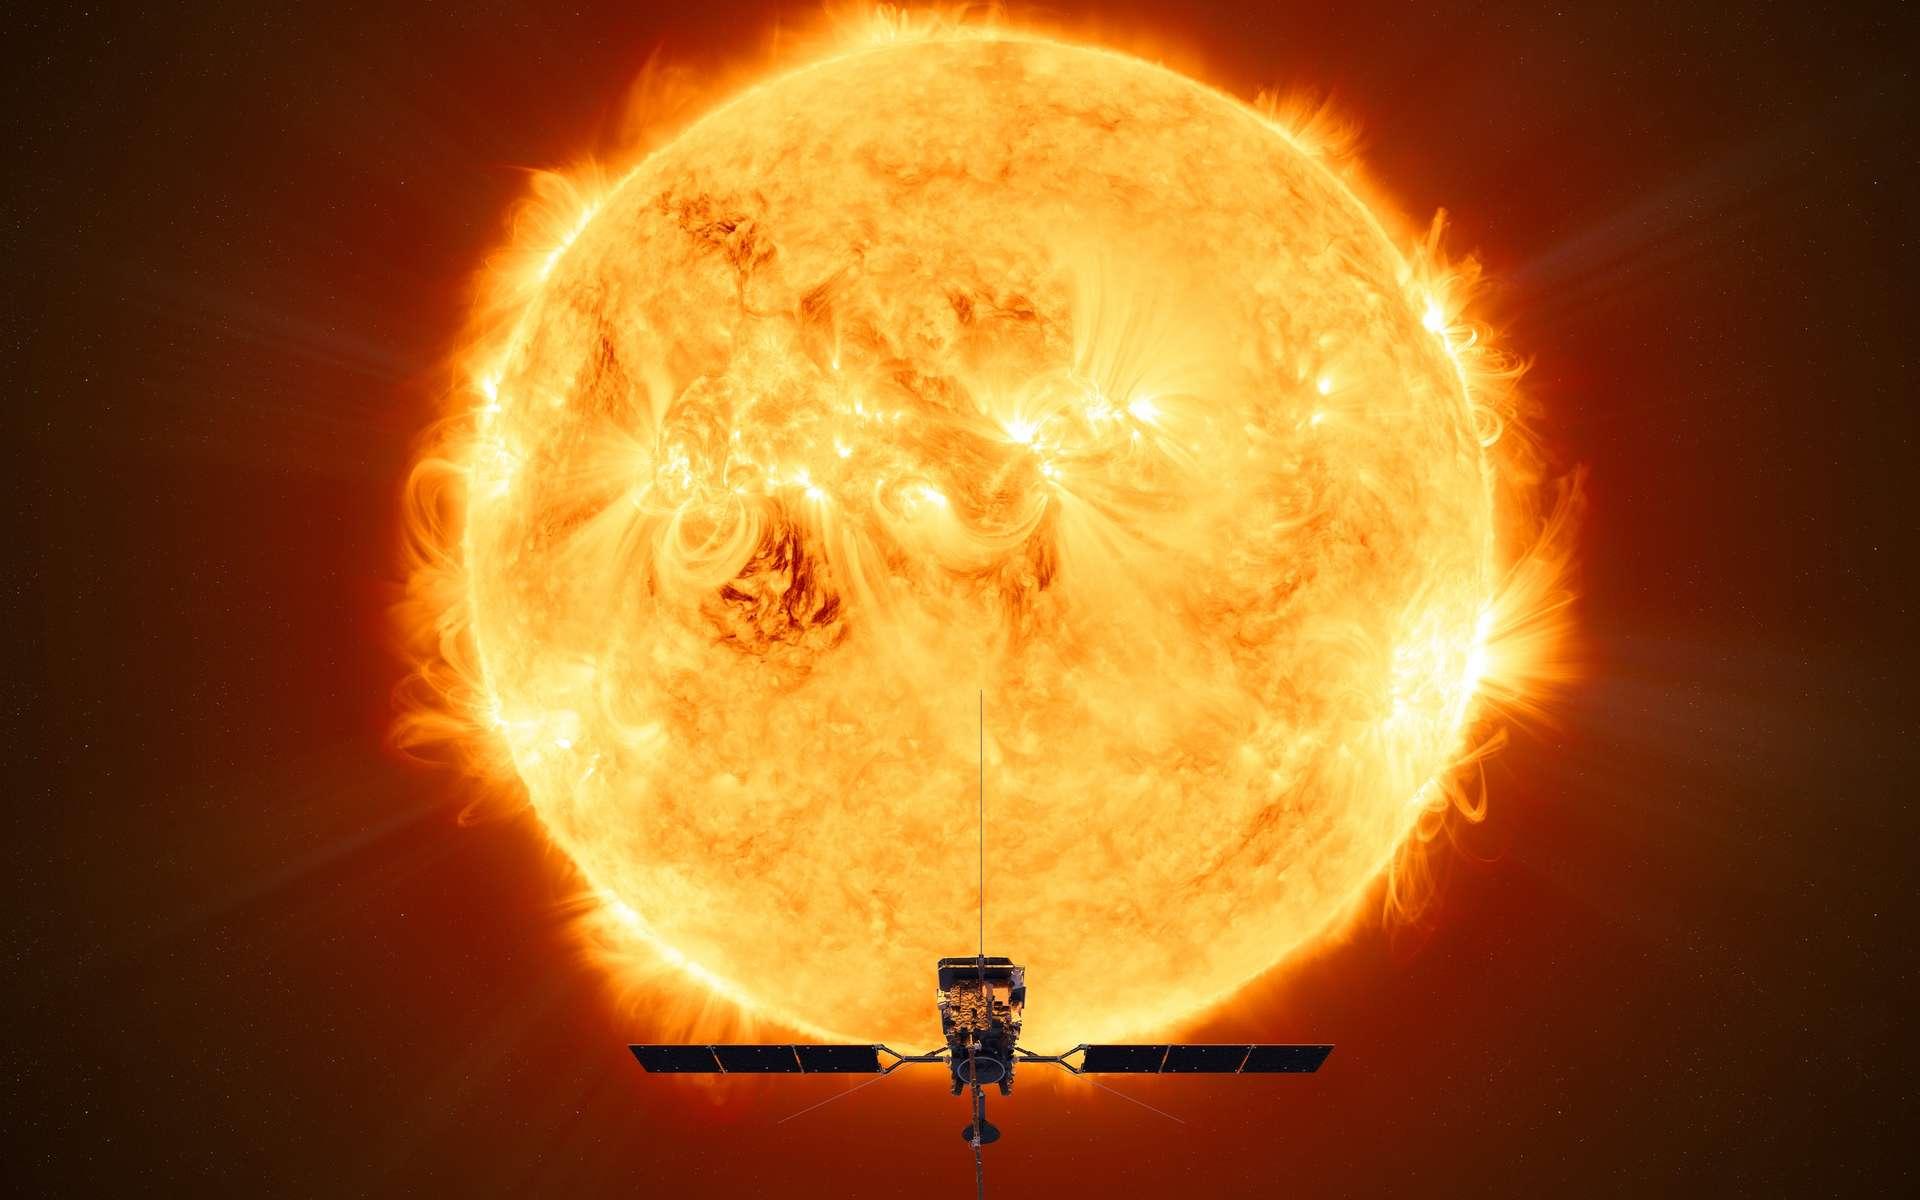 Illustration de la sonde Solar Orbiter (ESA) devant le Soleil. © ESA, ATG medialab